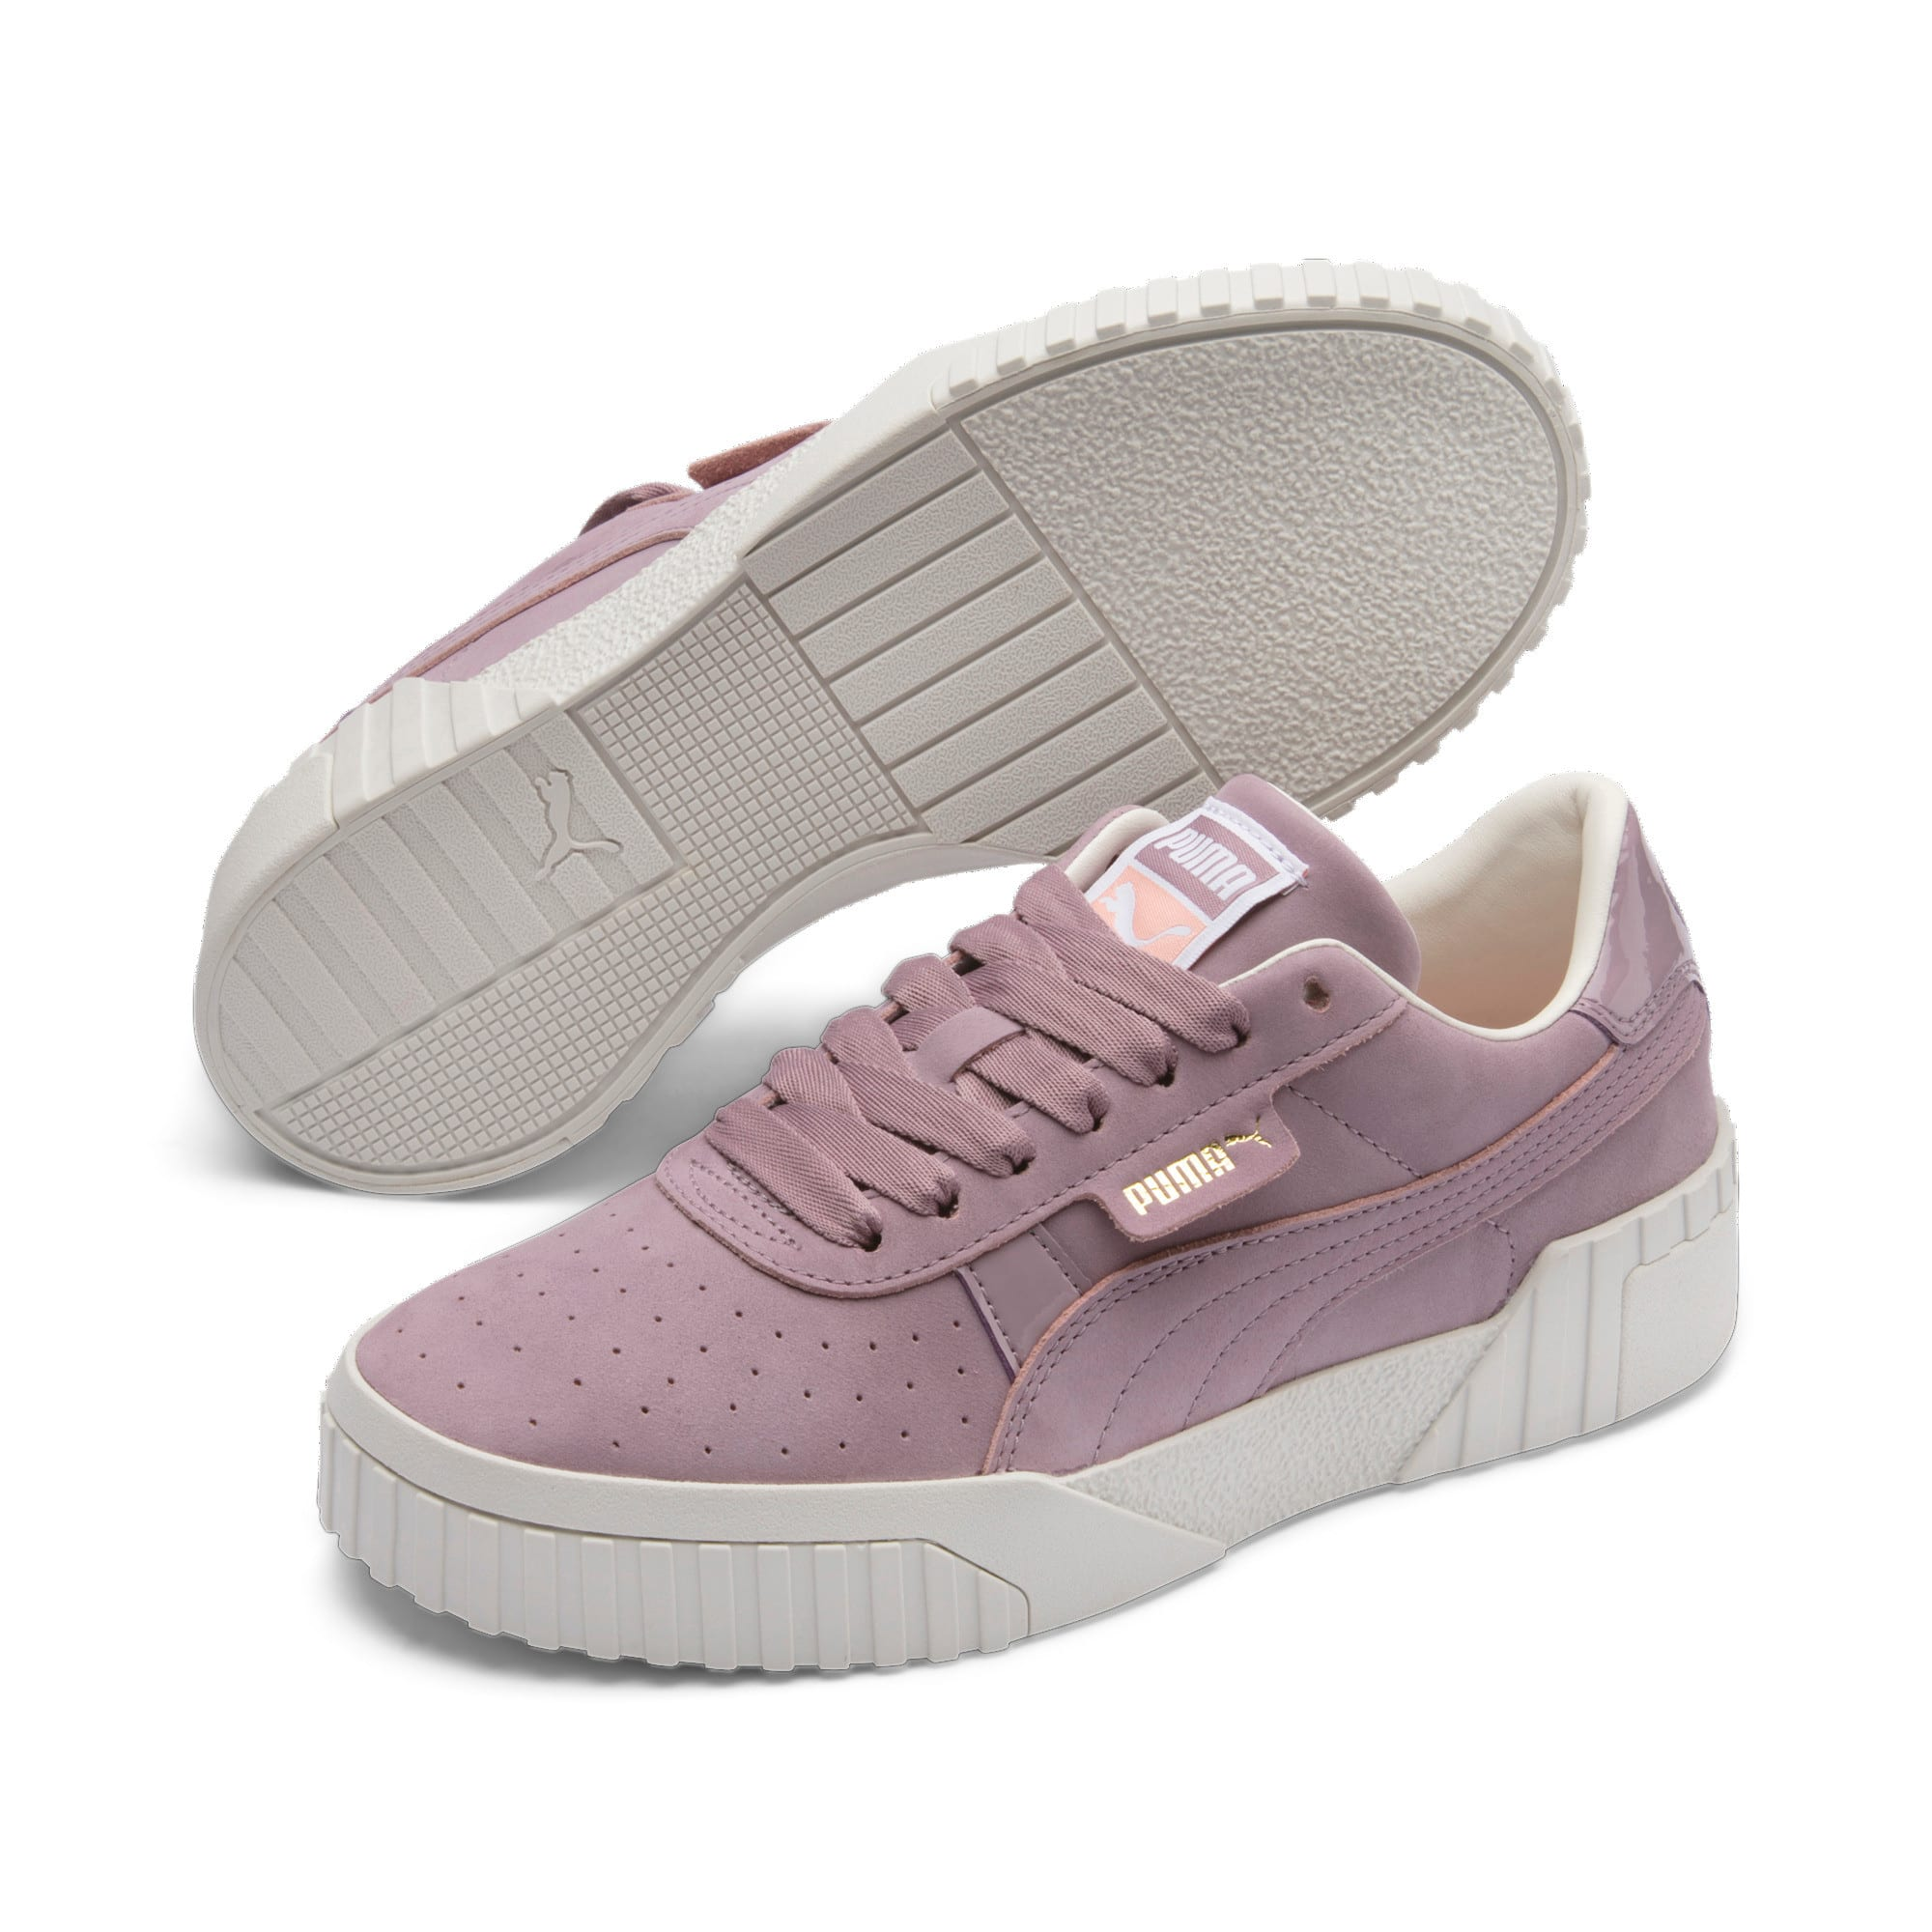 Thumbnail 4 of Cali Nubuck Women's Sneakers, Elderberry, medium